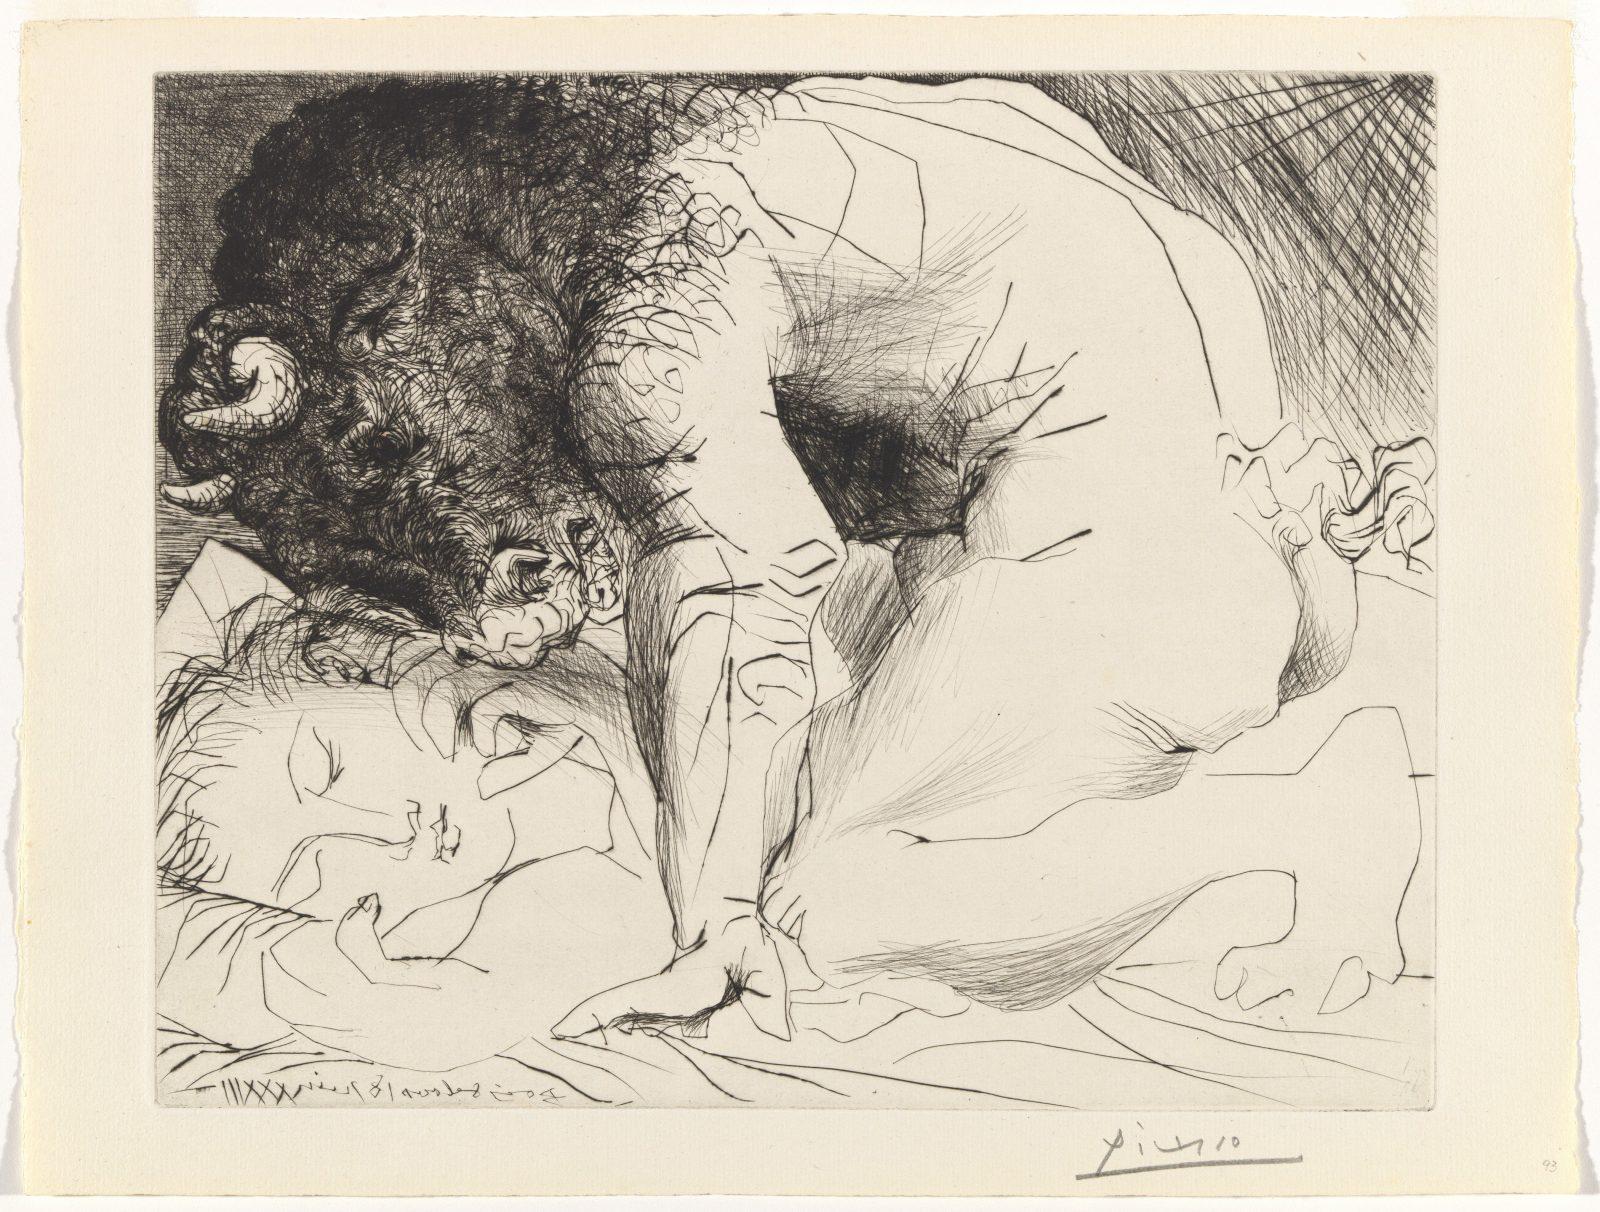 Pablo Picasso, Minotaur caressing a sleeping woman, 1933-34